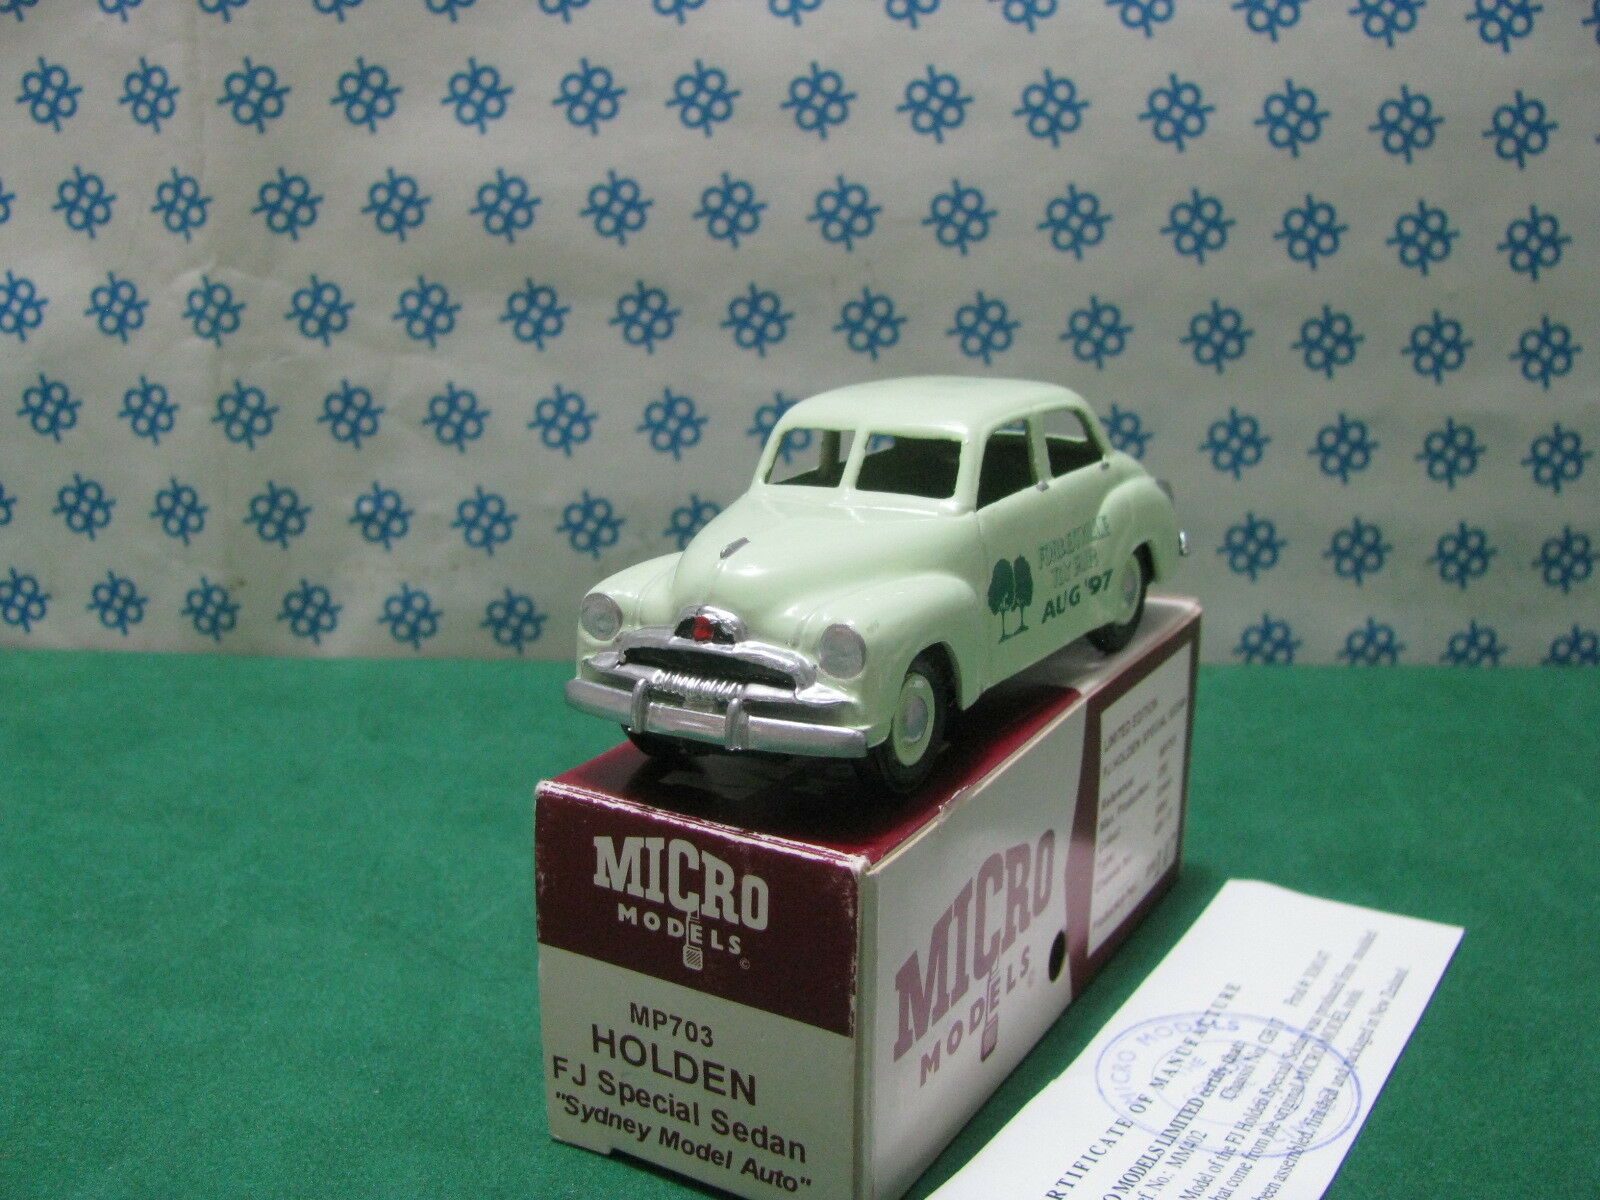 Vintage Micro Models - Holden FJ Special   Sydney Model Auto   Mm402 - MIB